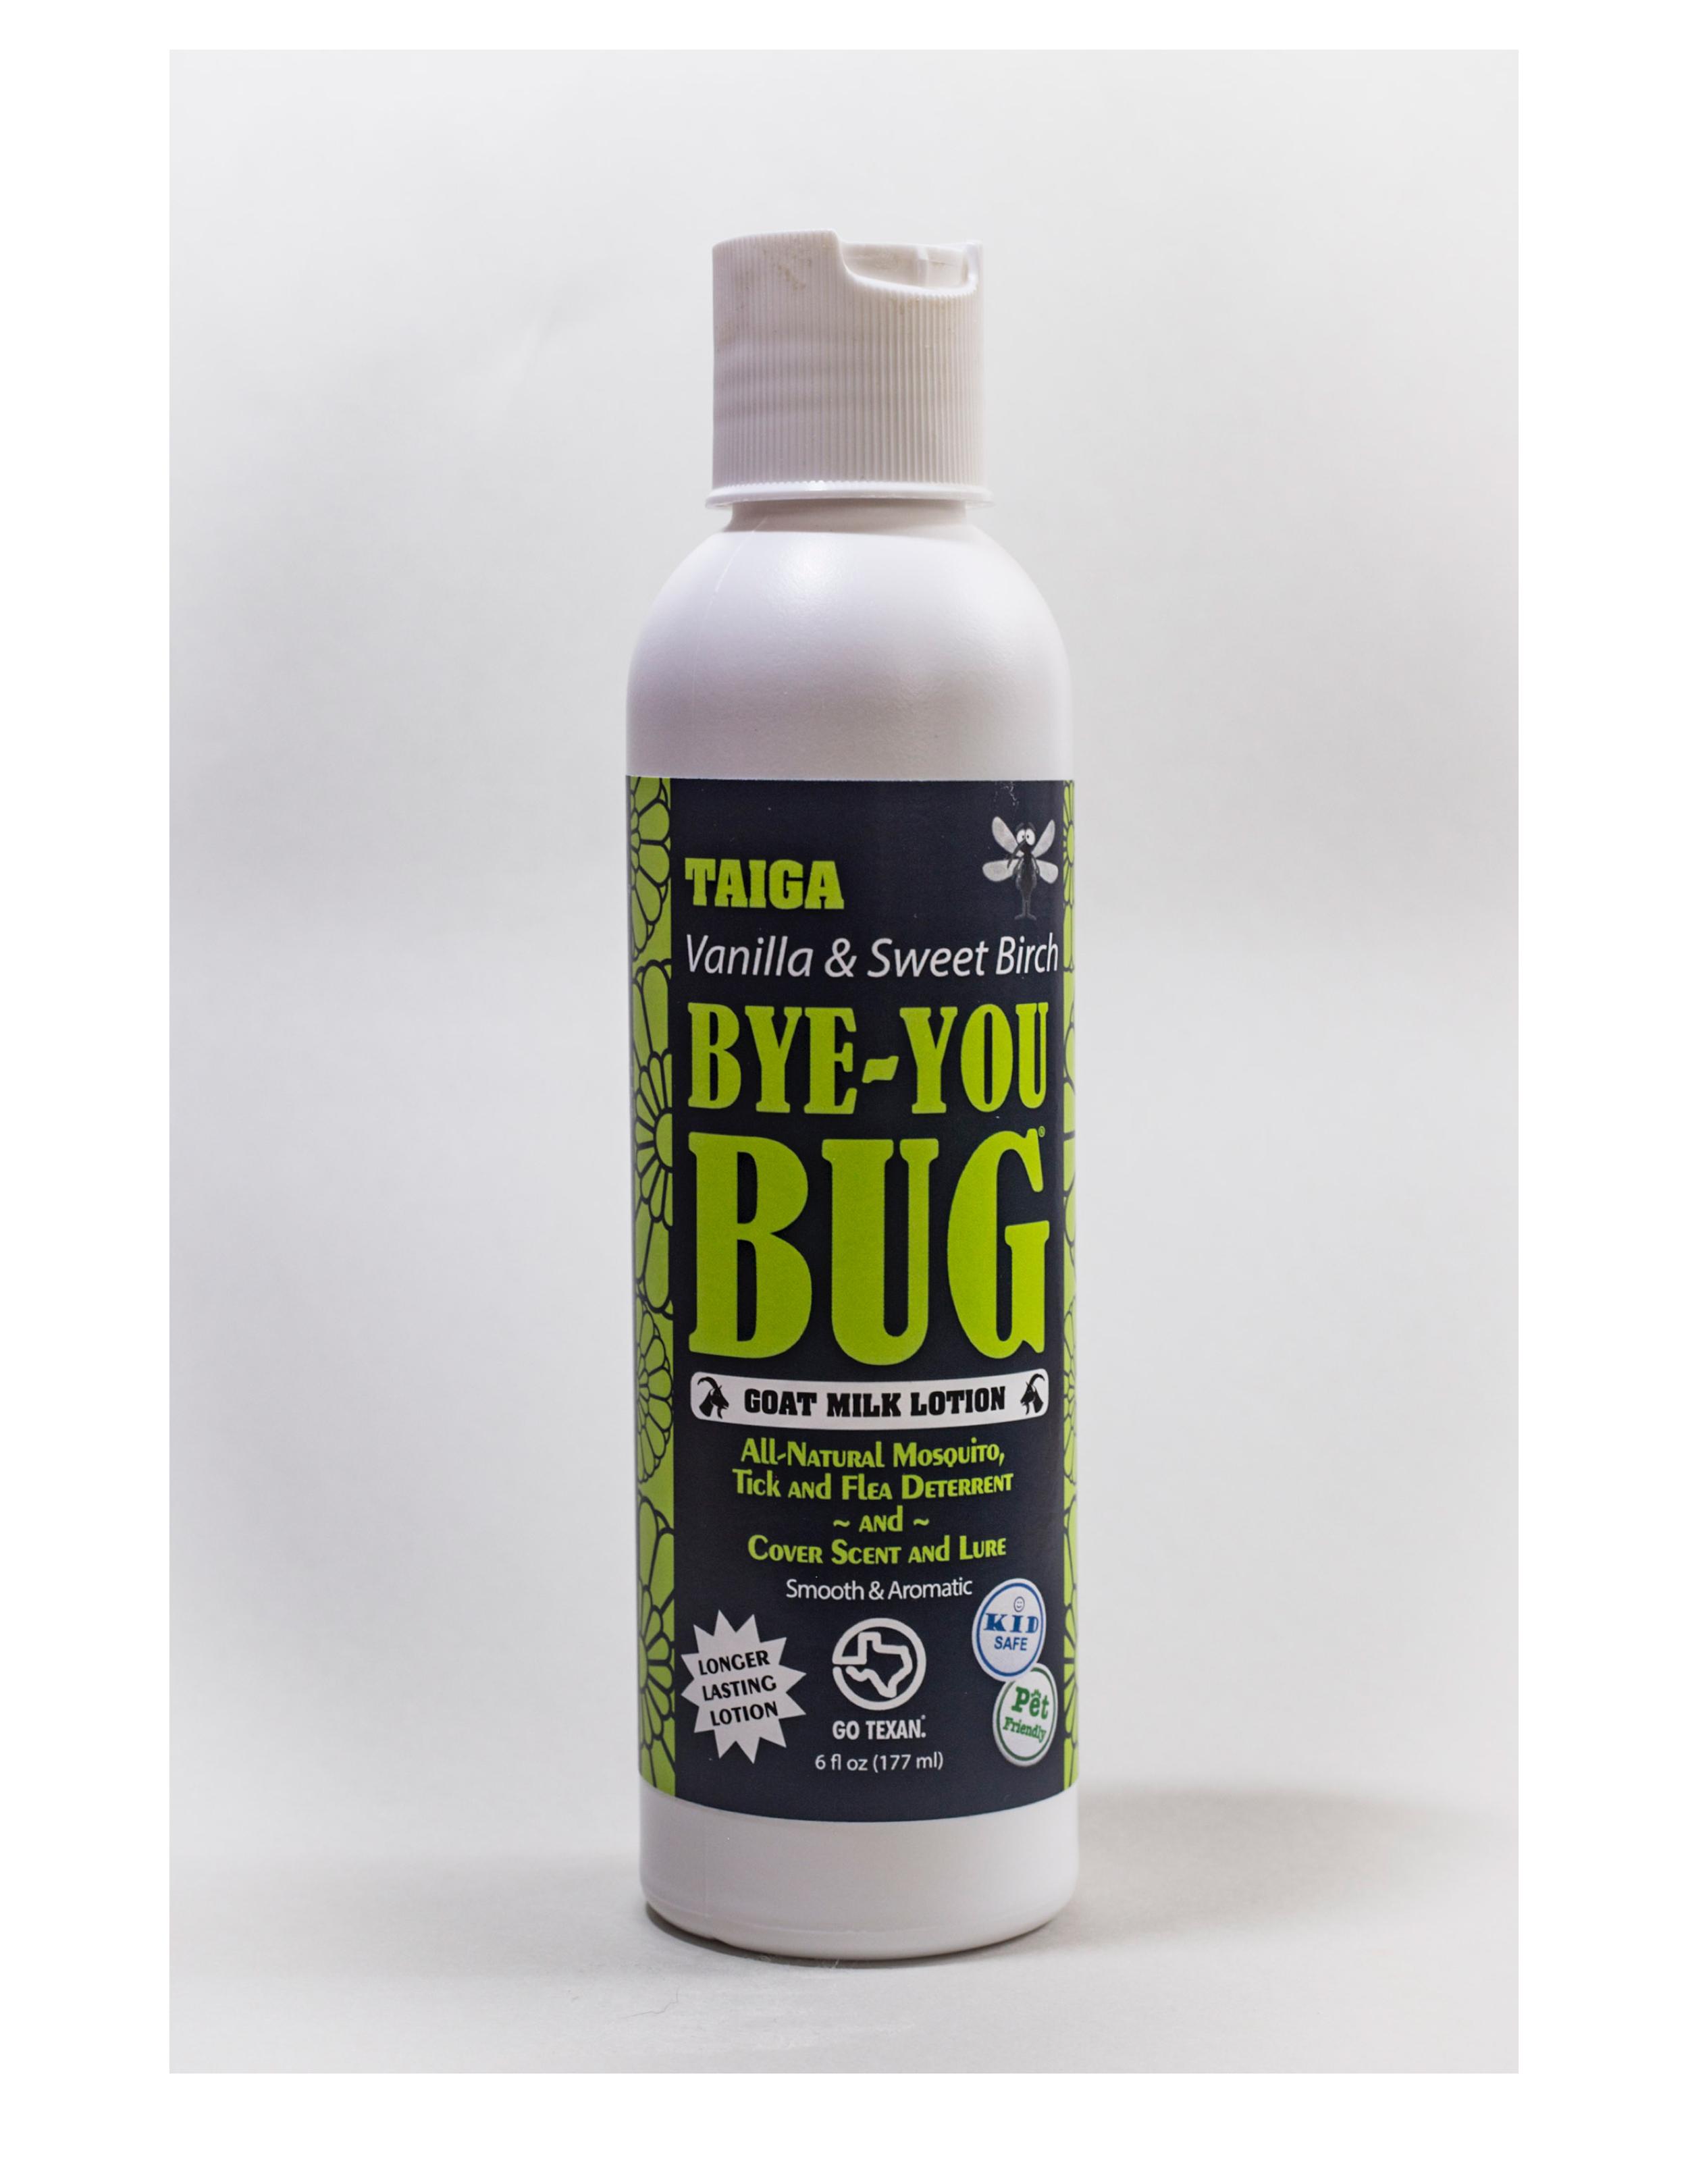 mcdonner bye you Bug final for print-2.jpg